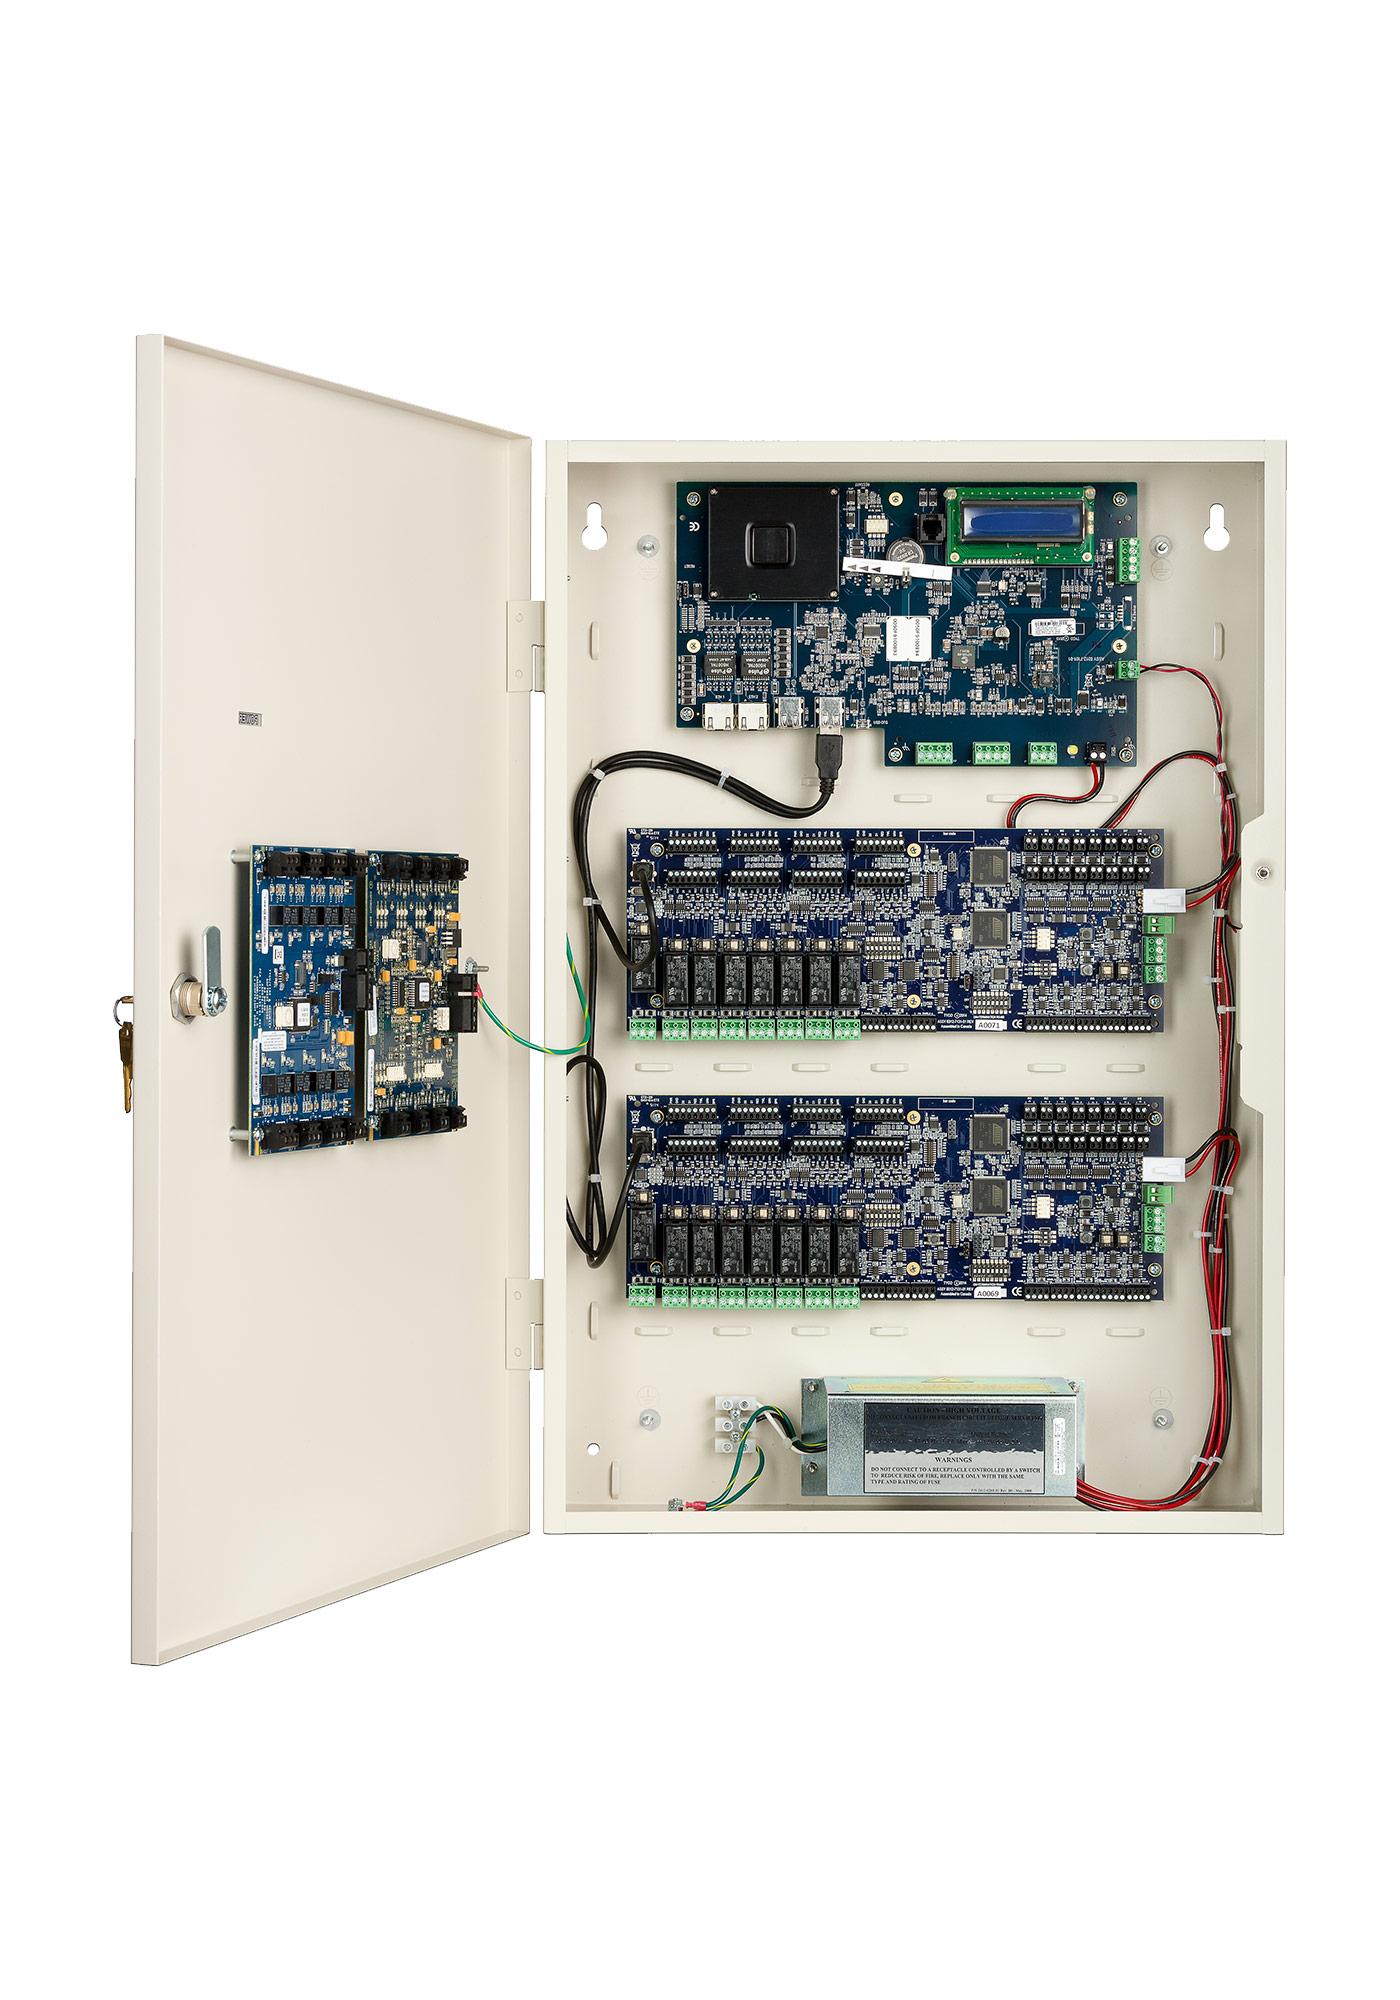 istar-ultra-se-open-boards_p3_01_na_w.jpg Acm Wiring Diagram on